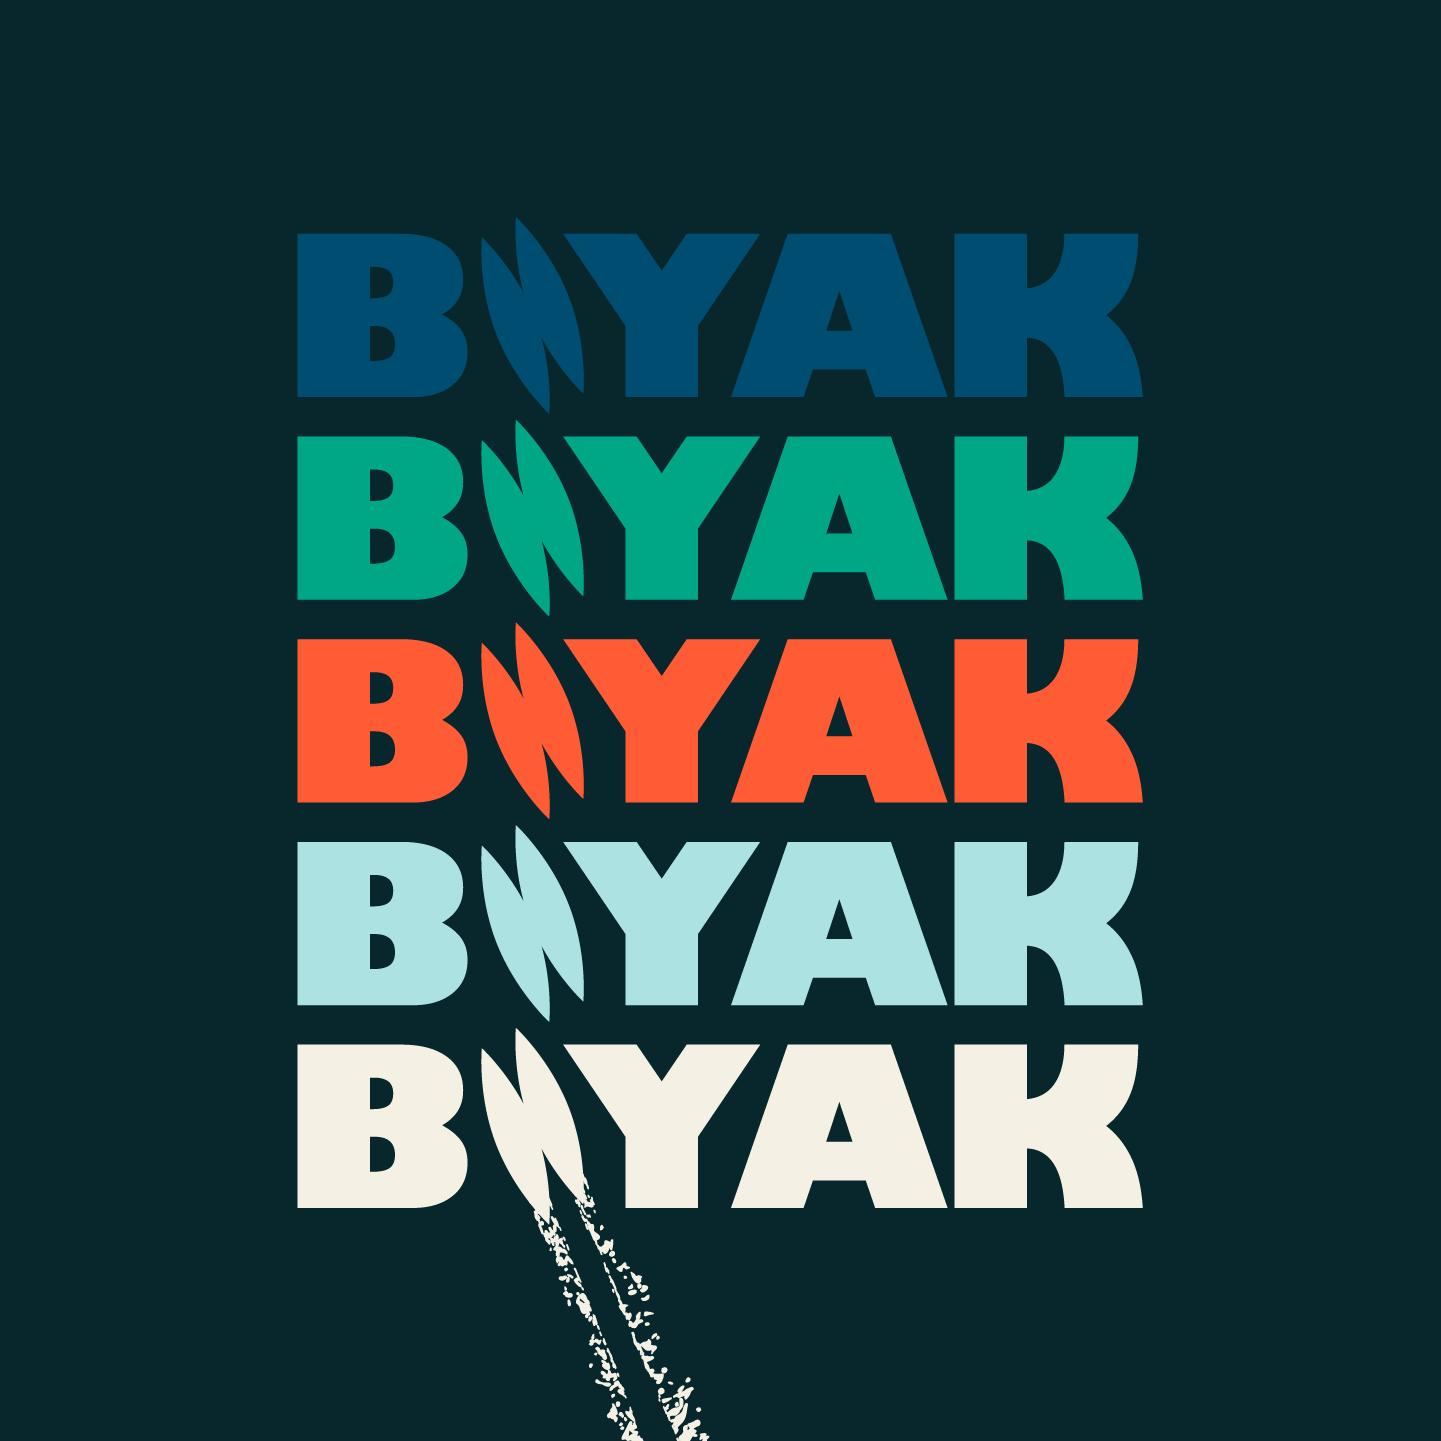 biyak1